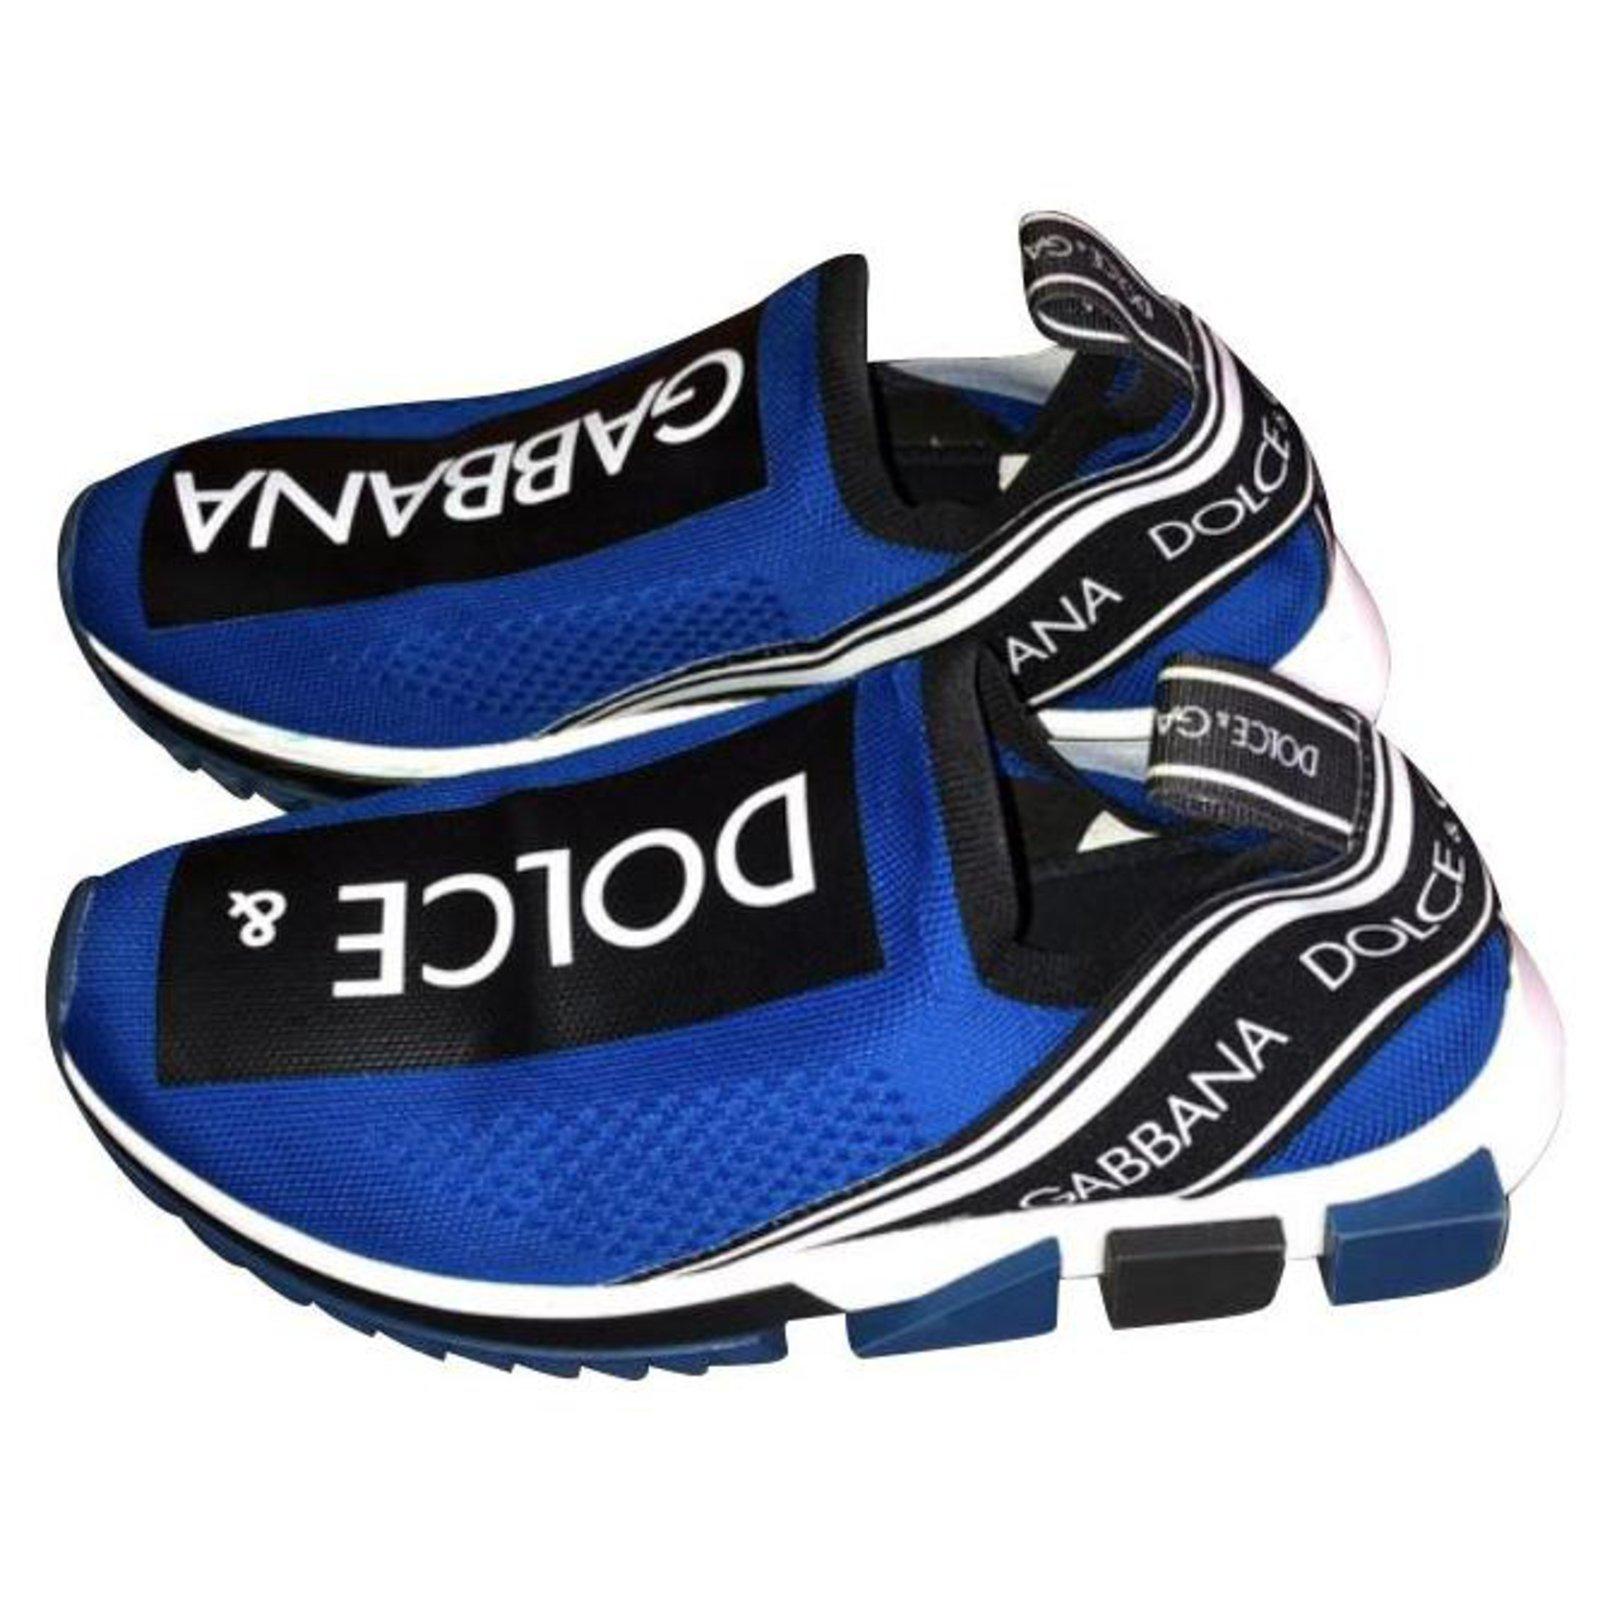 Dolce \u0026 Gabbana Sorrento Sneakers Other